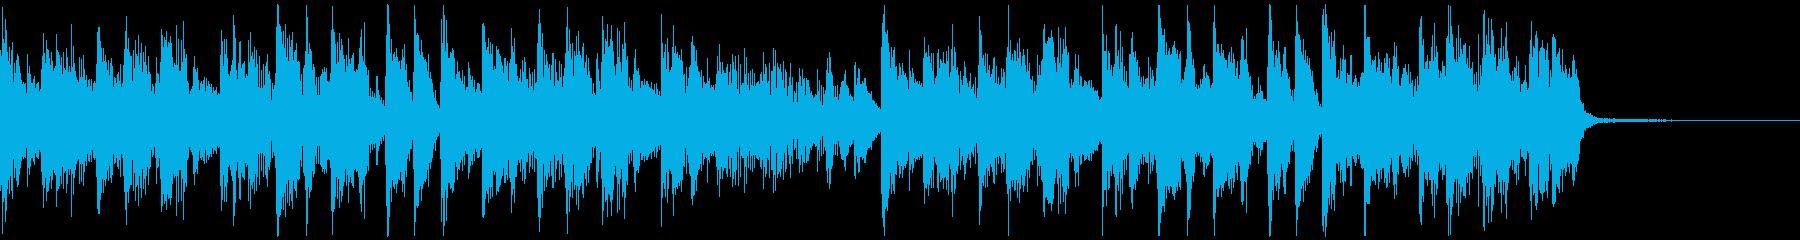 【CM】サックス・ジャズ・1の再生済みの波形